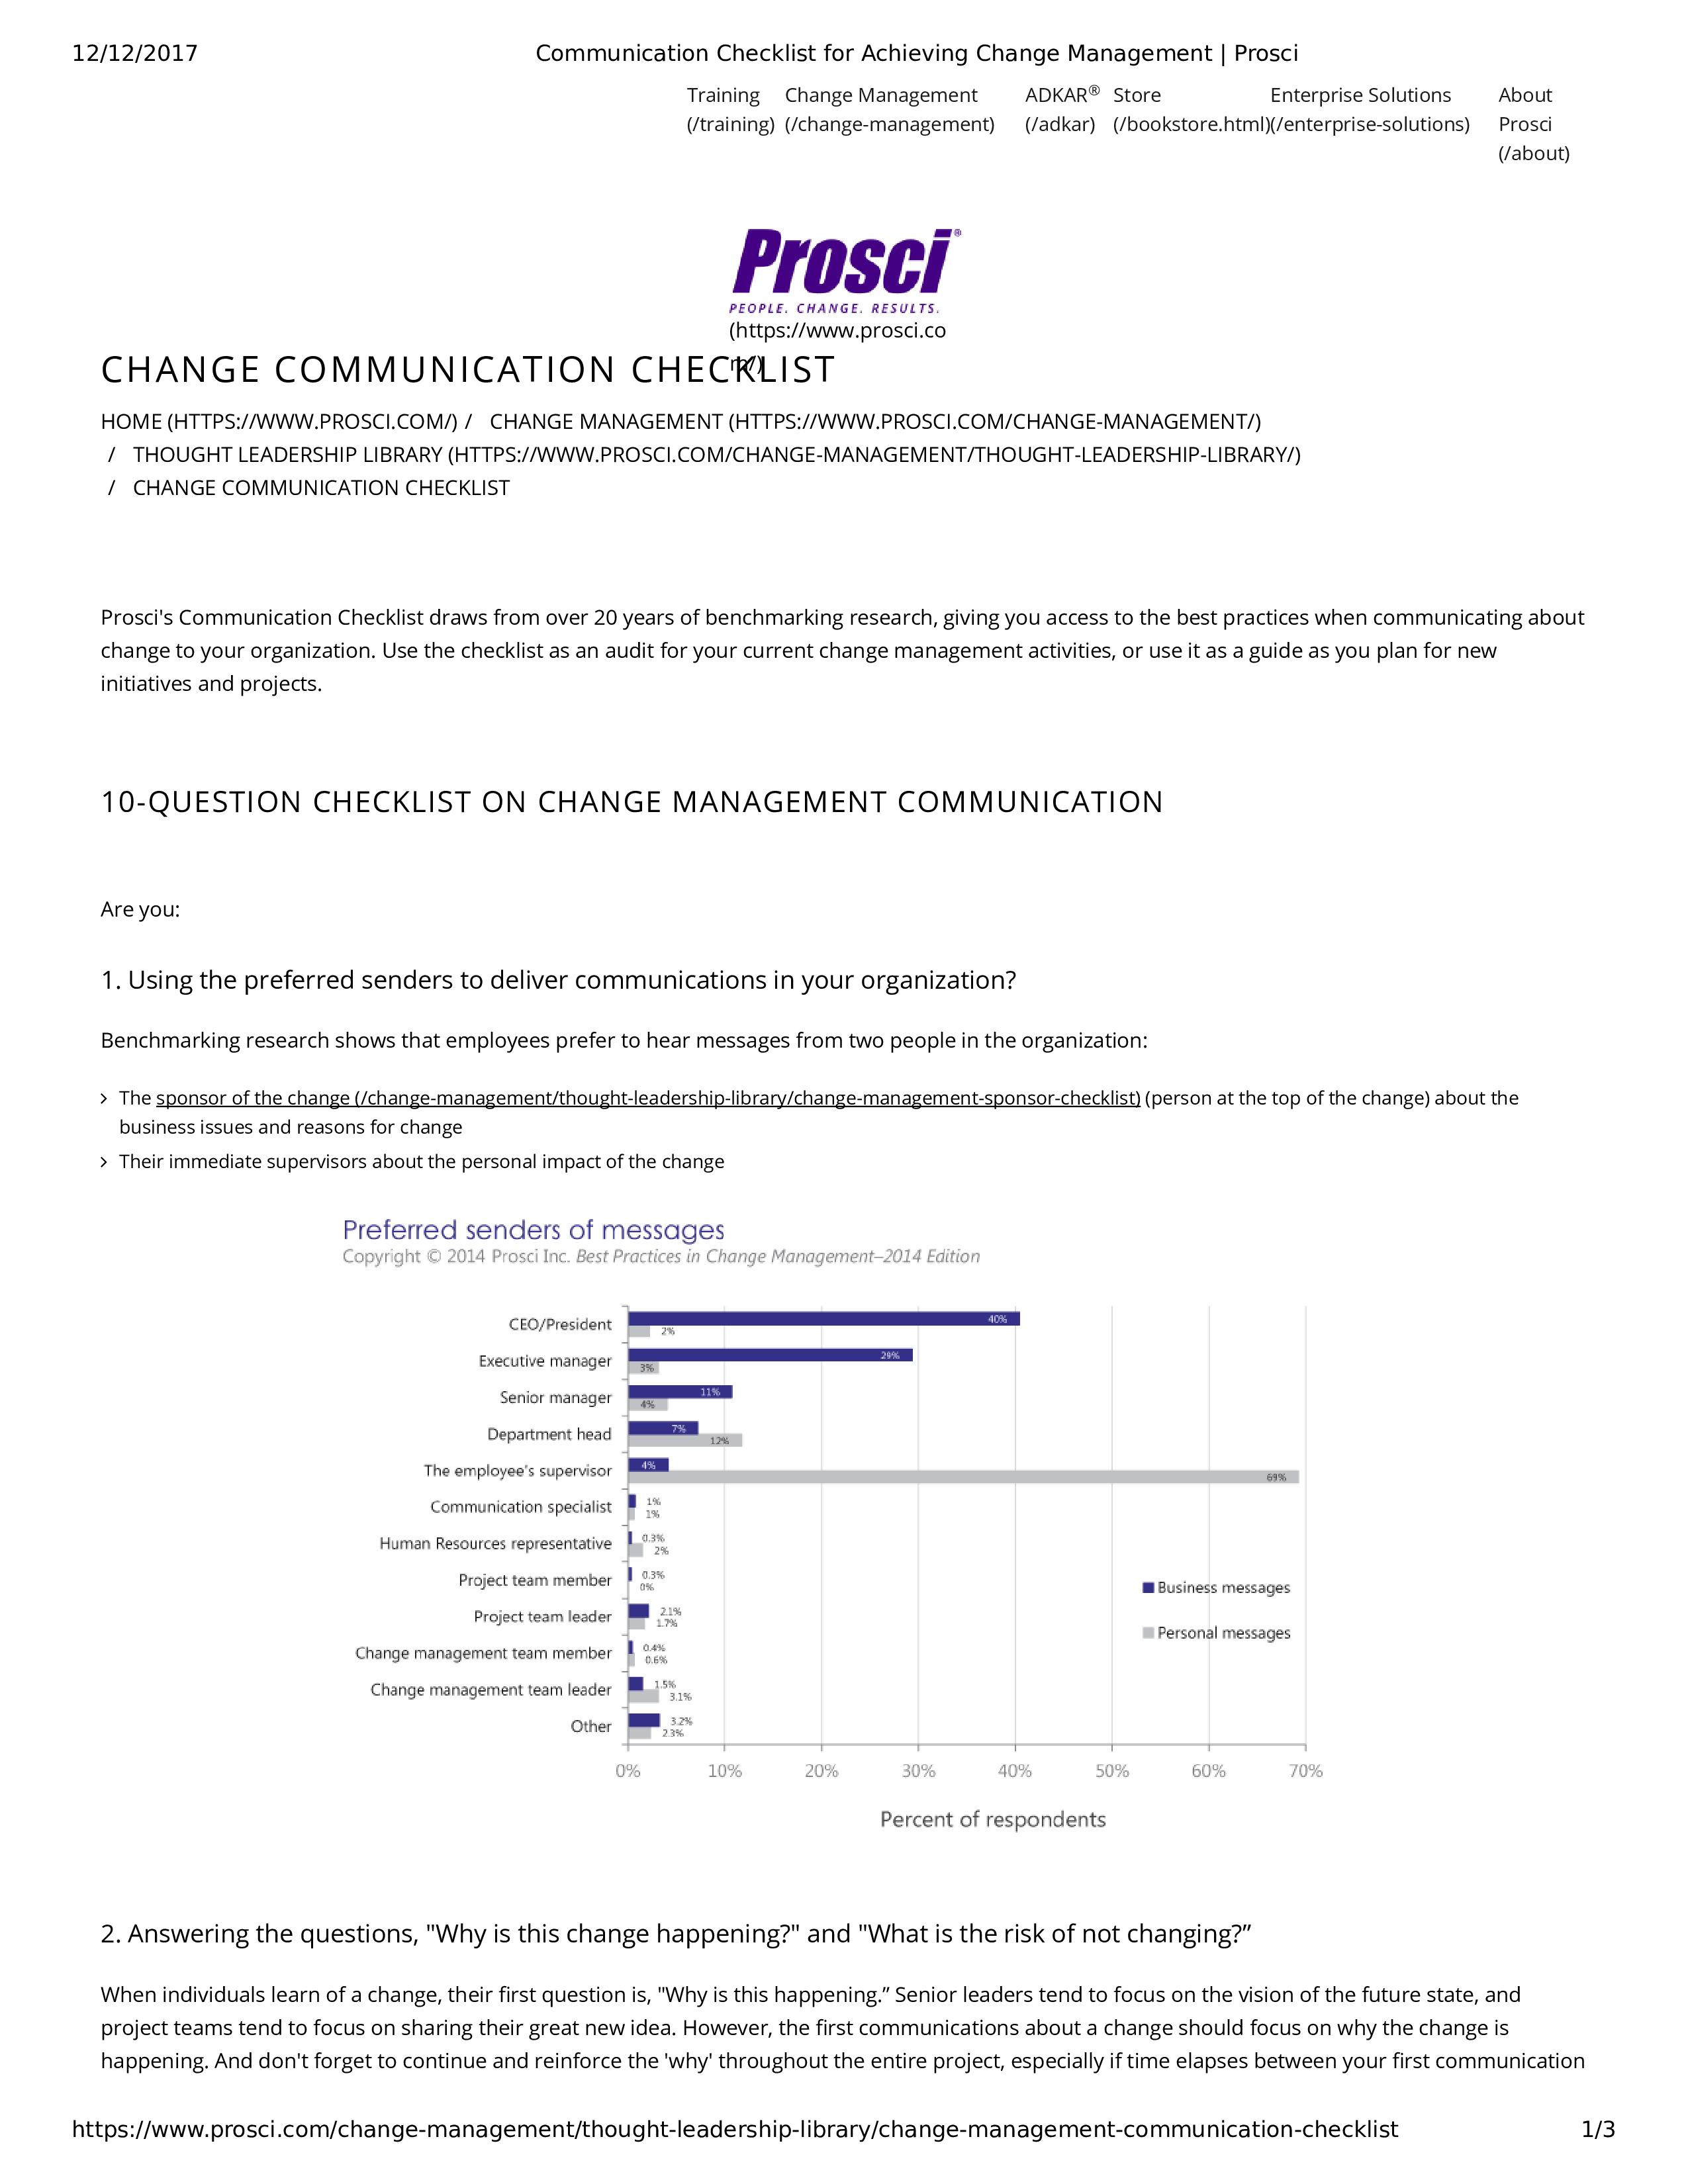 Free Communication Checklist Achieving Change Management Templates